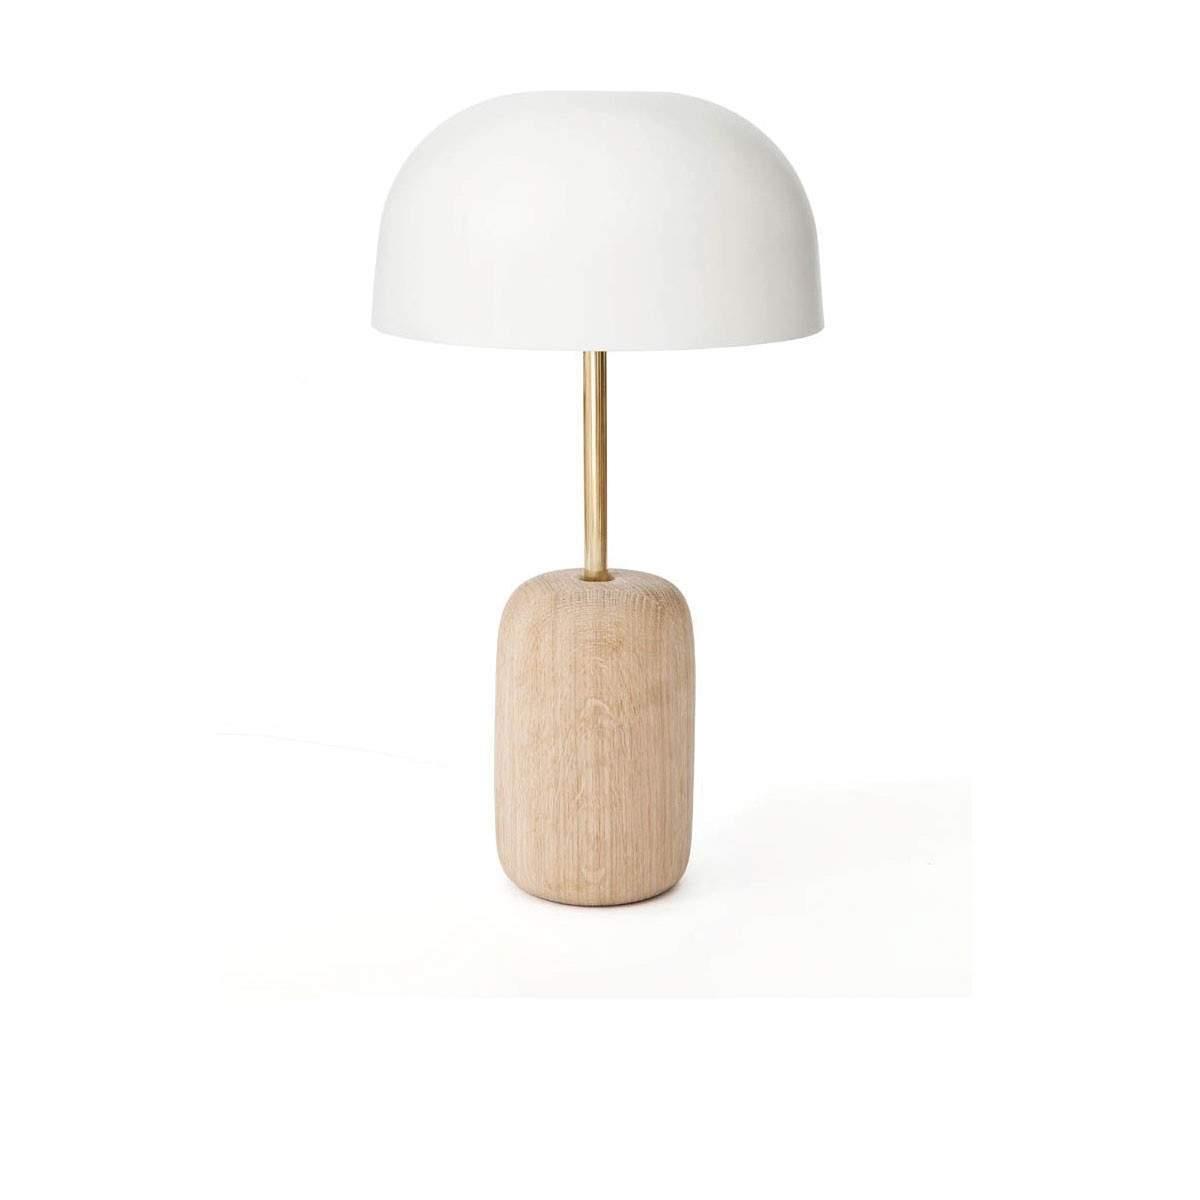 La lampe Nina - Hartô